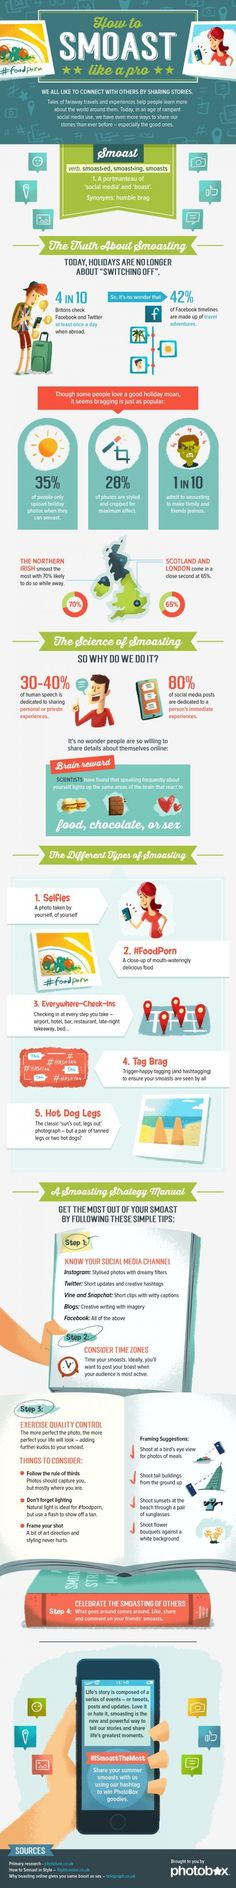 How To #Smoast Like A Pro #Infographic | #socialmedia